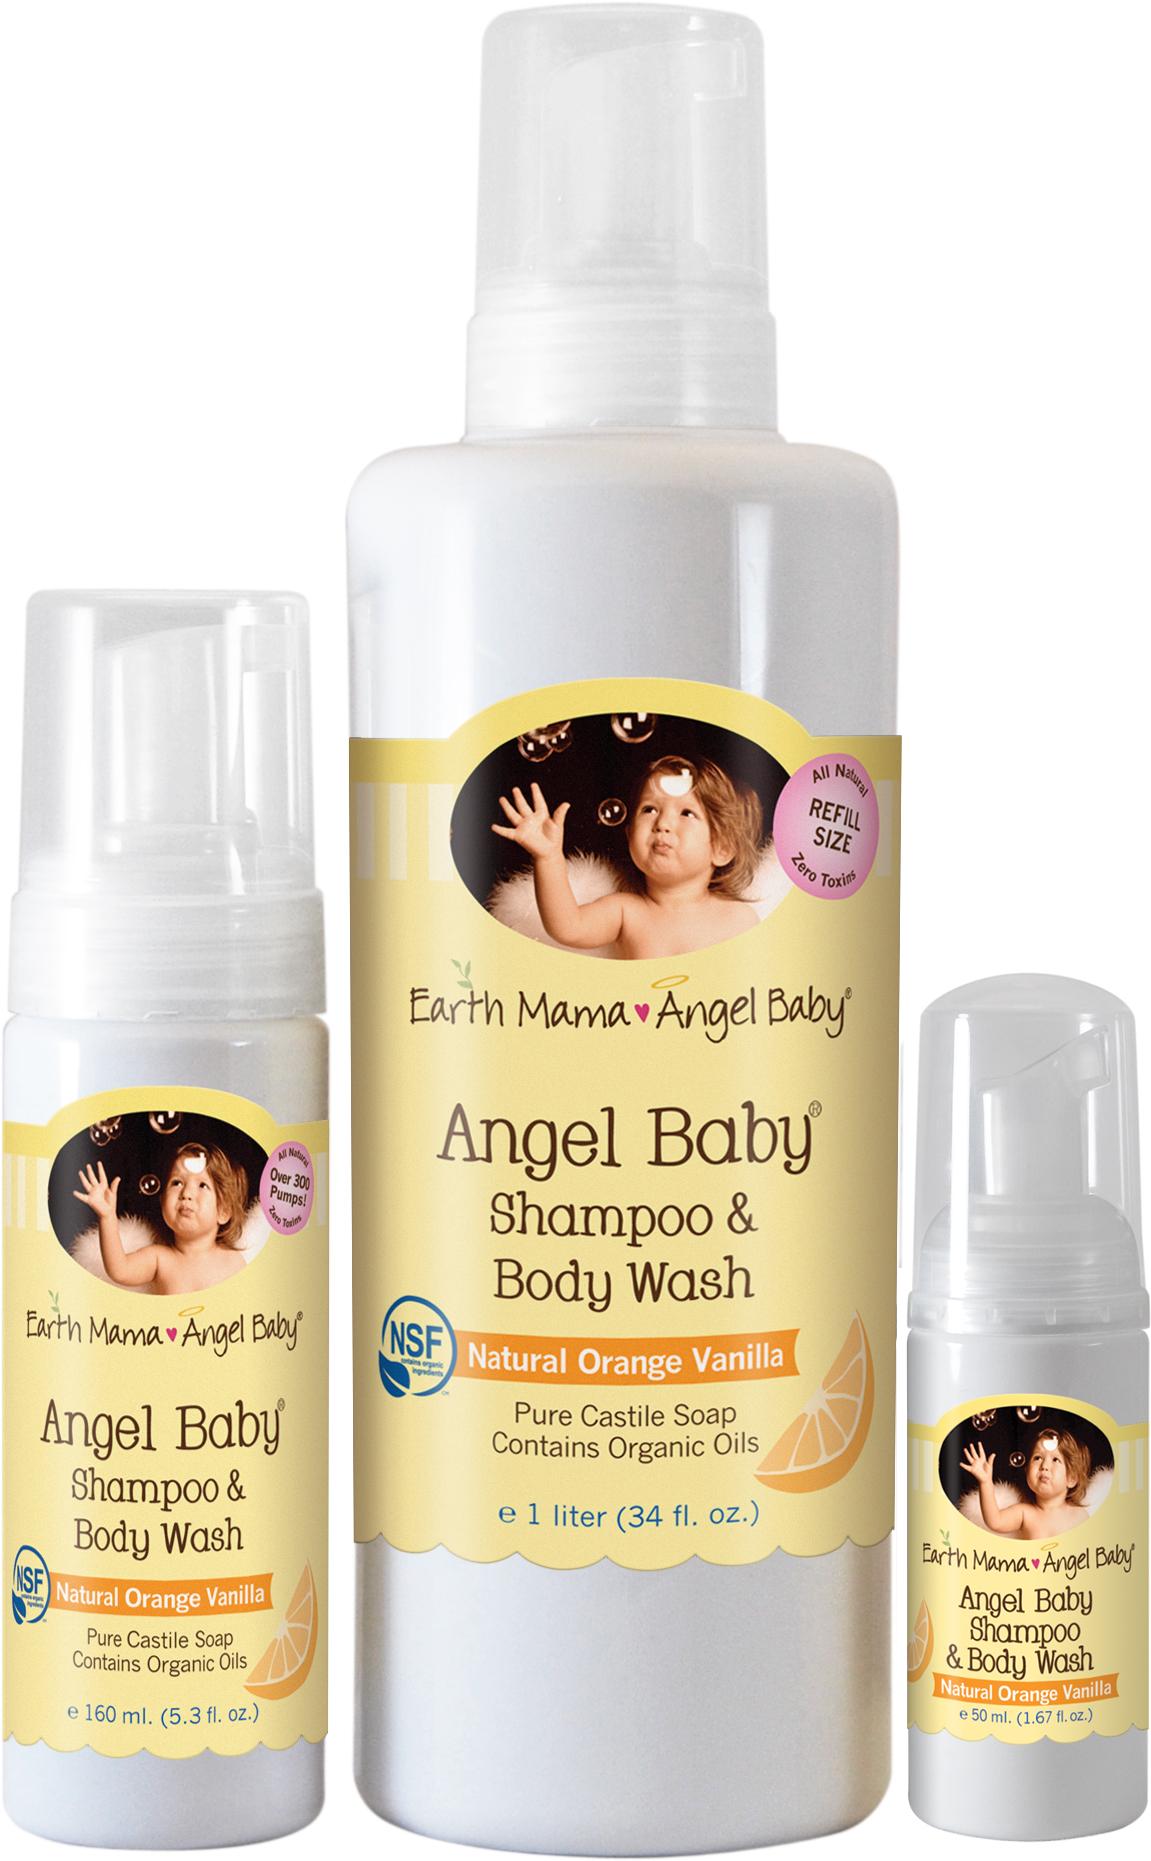 Earth Mama Angel Baby – Angel Baby Shampoo & Body Wash